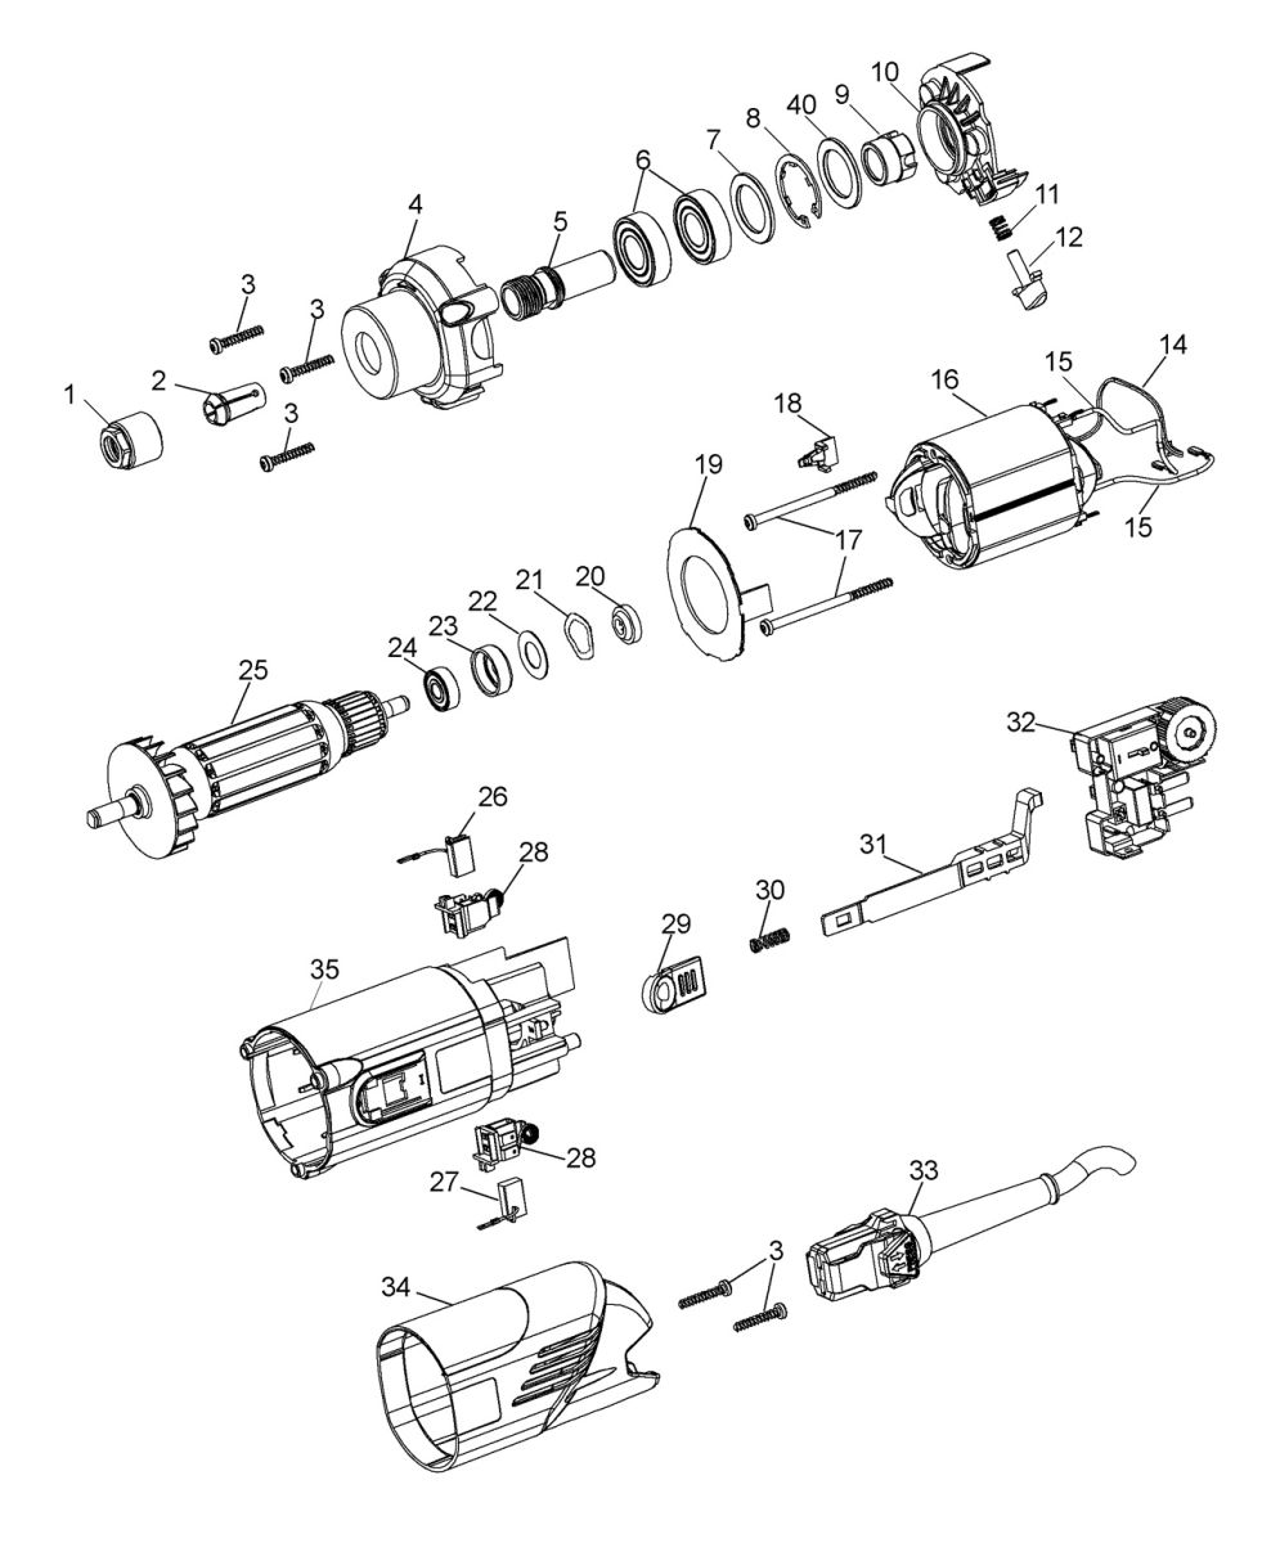 2458 kress 1050 spare parts